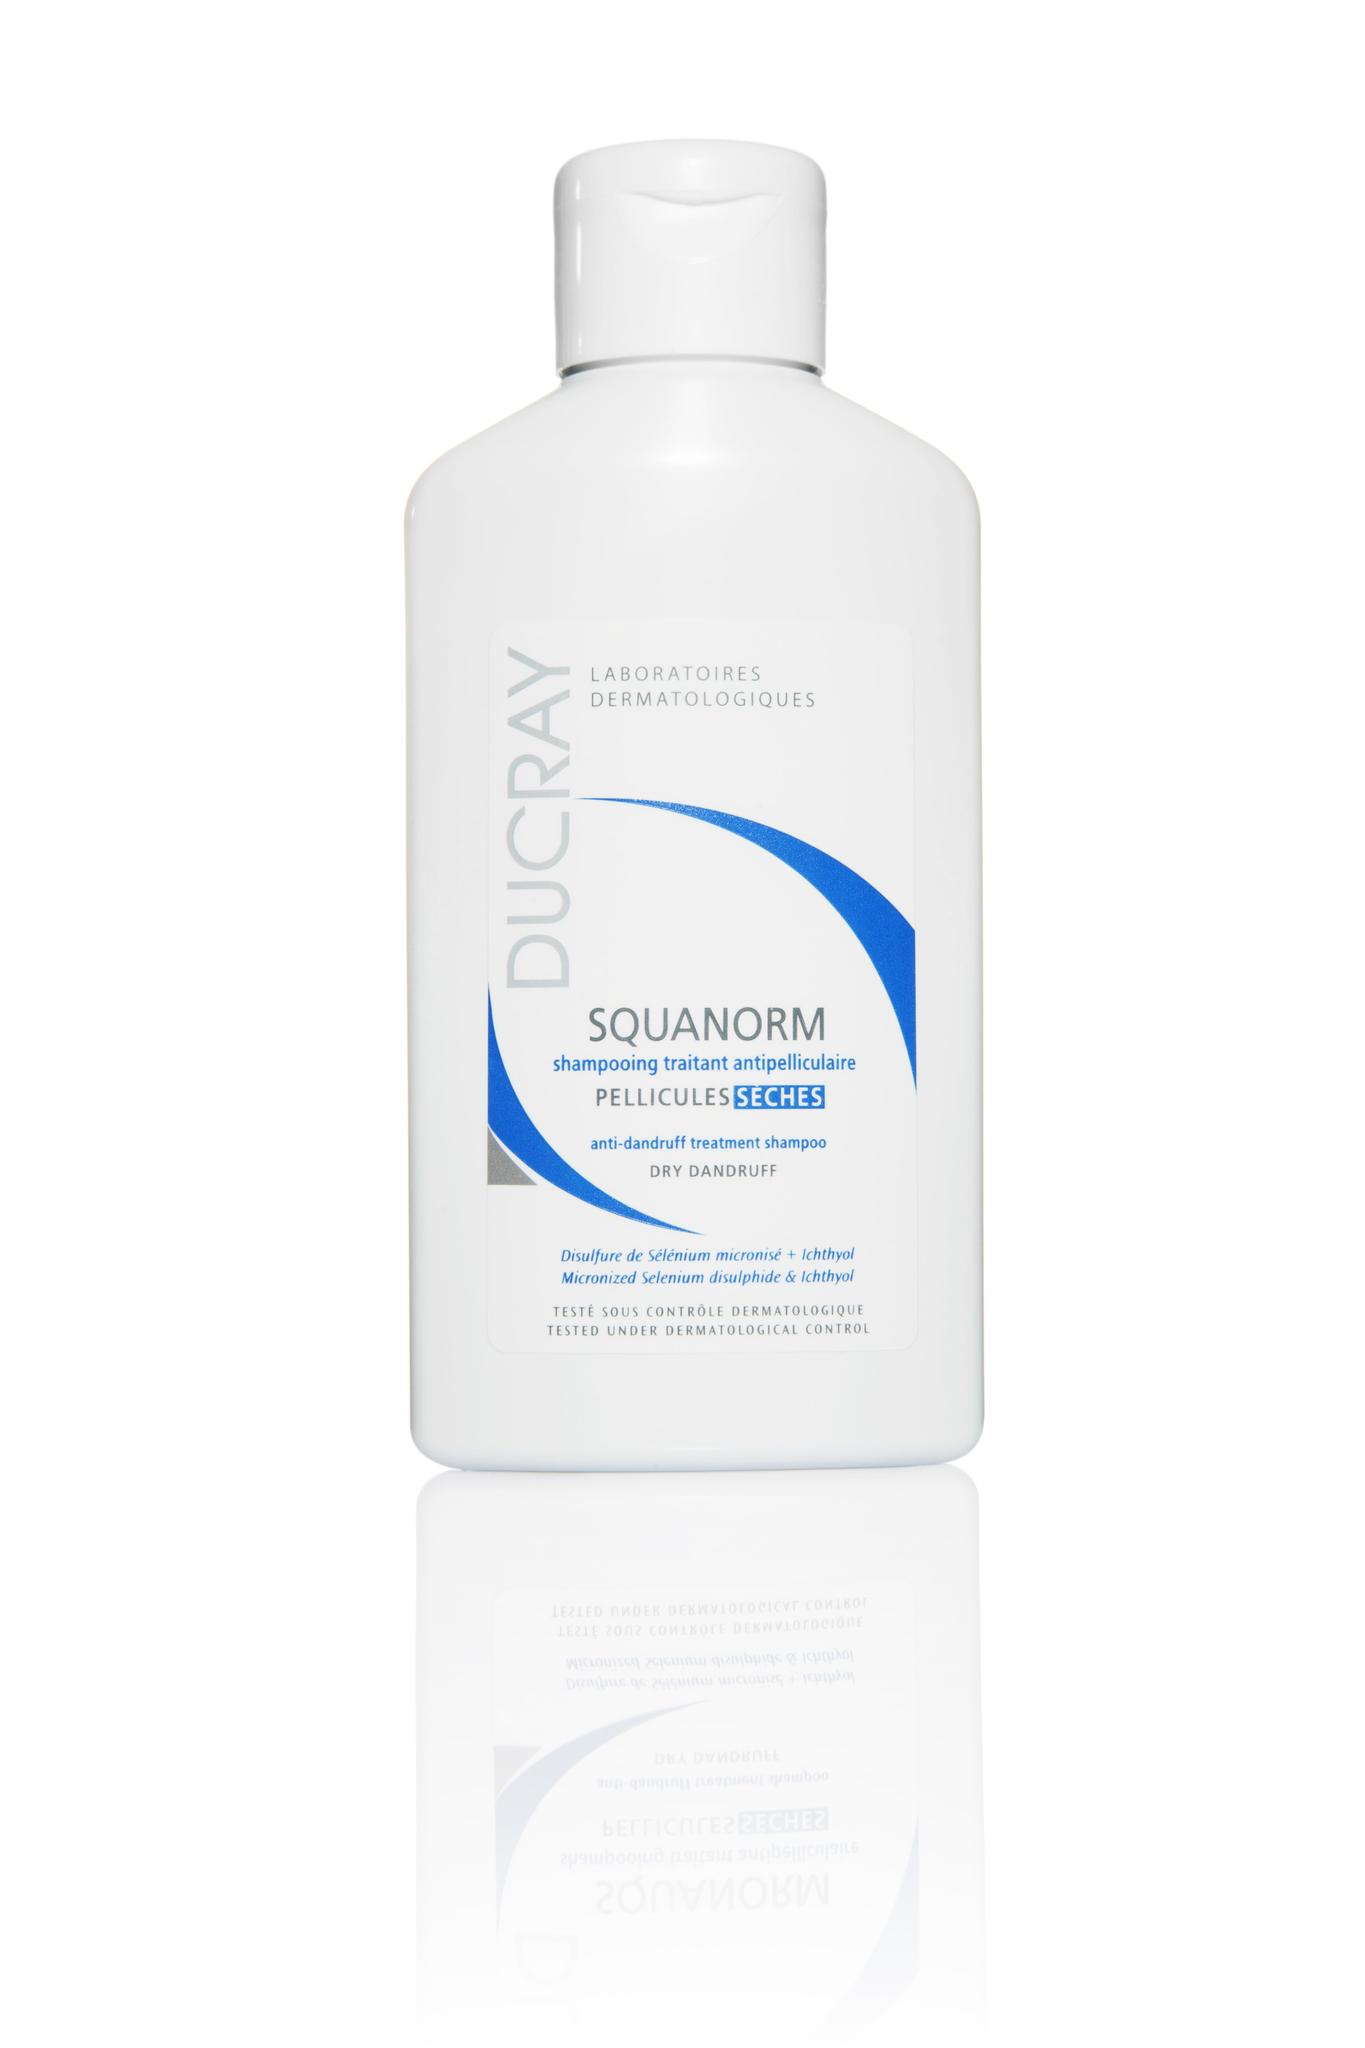 Ducray Squanorm шампунь от сухой перхоти 125 мл.